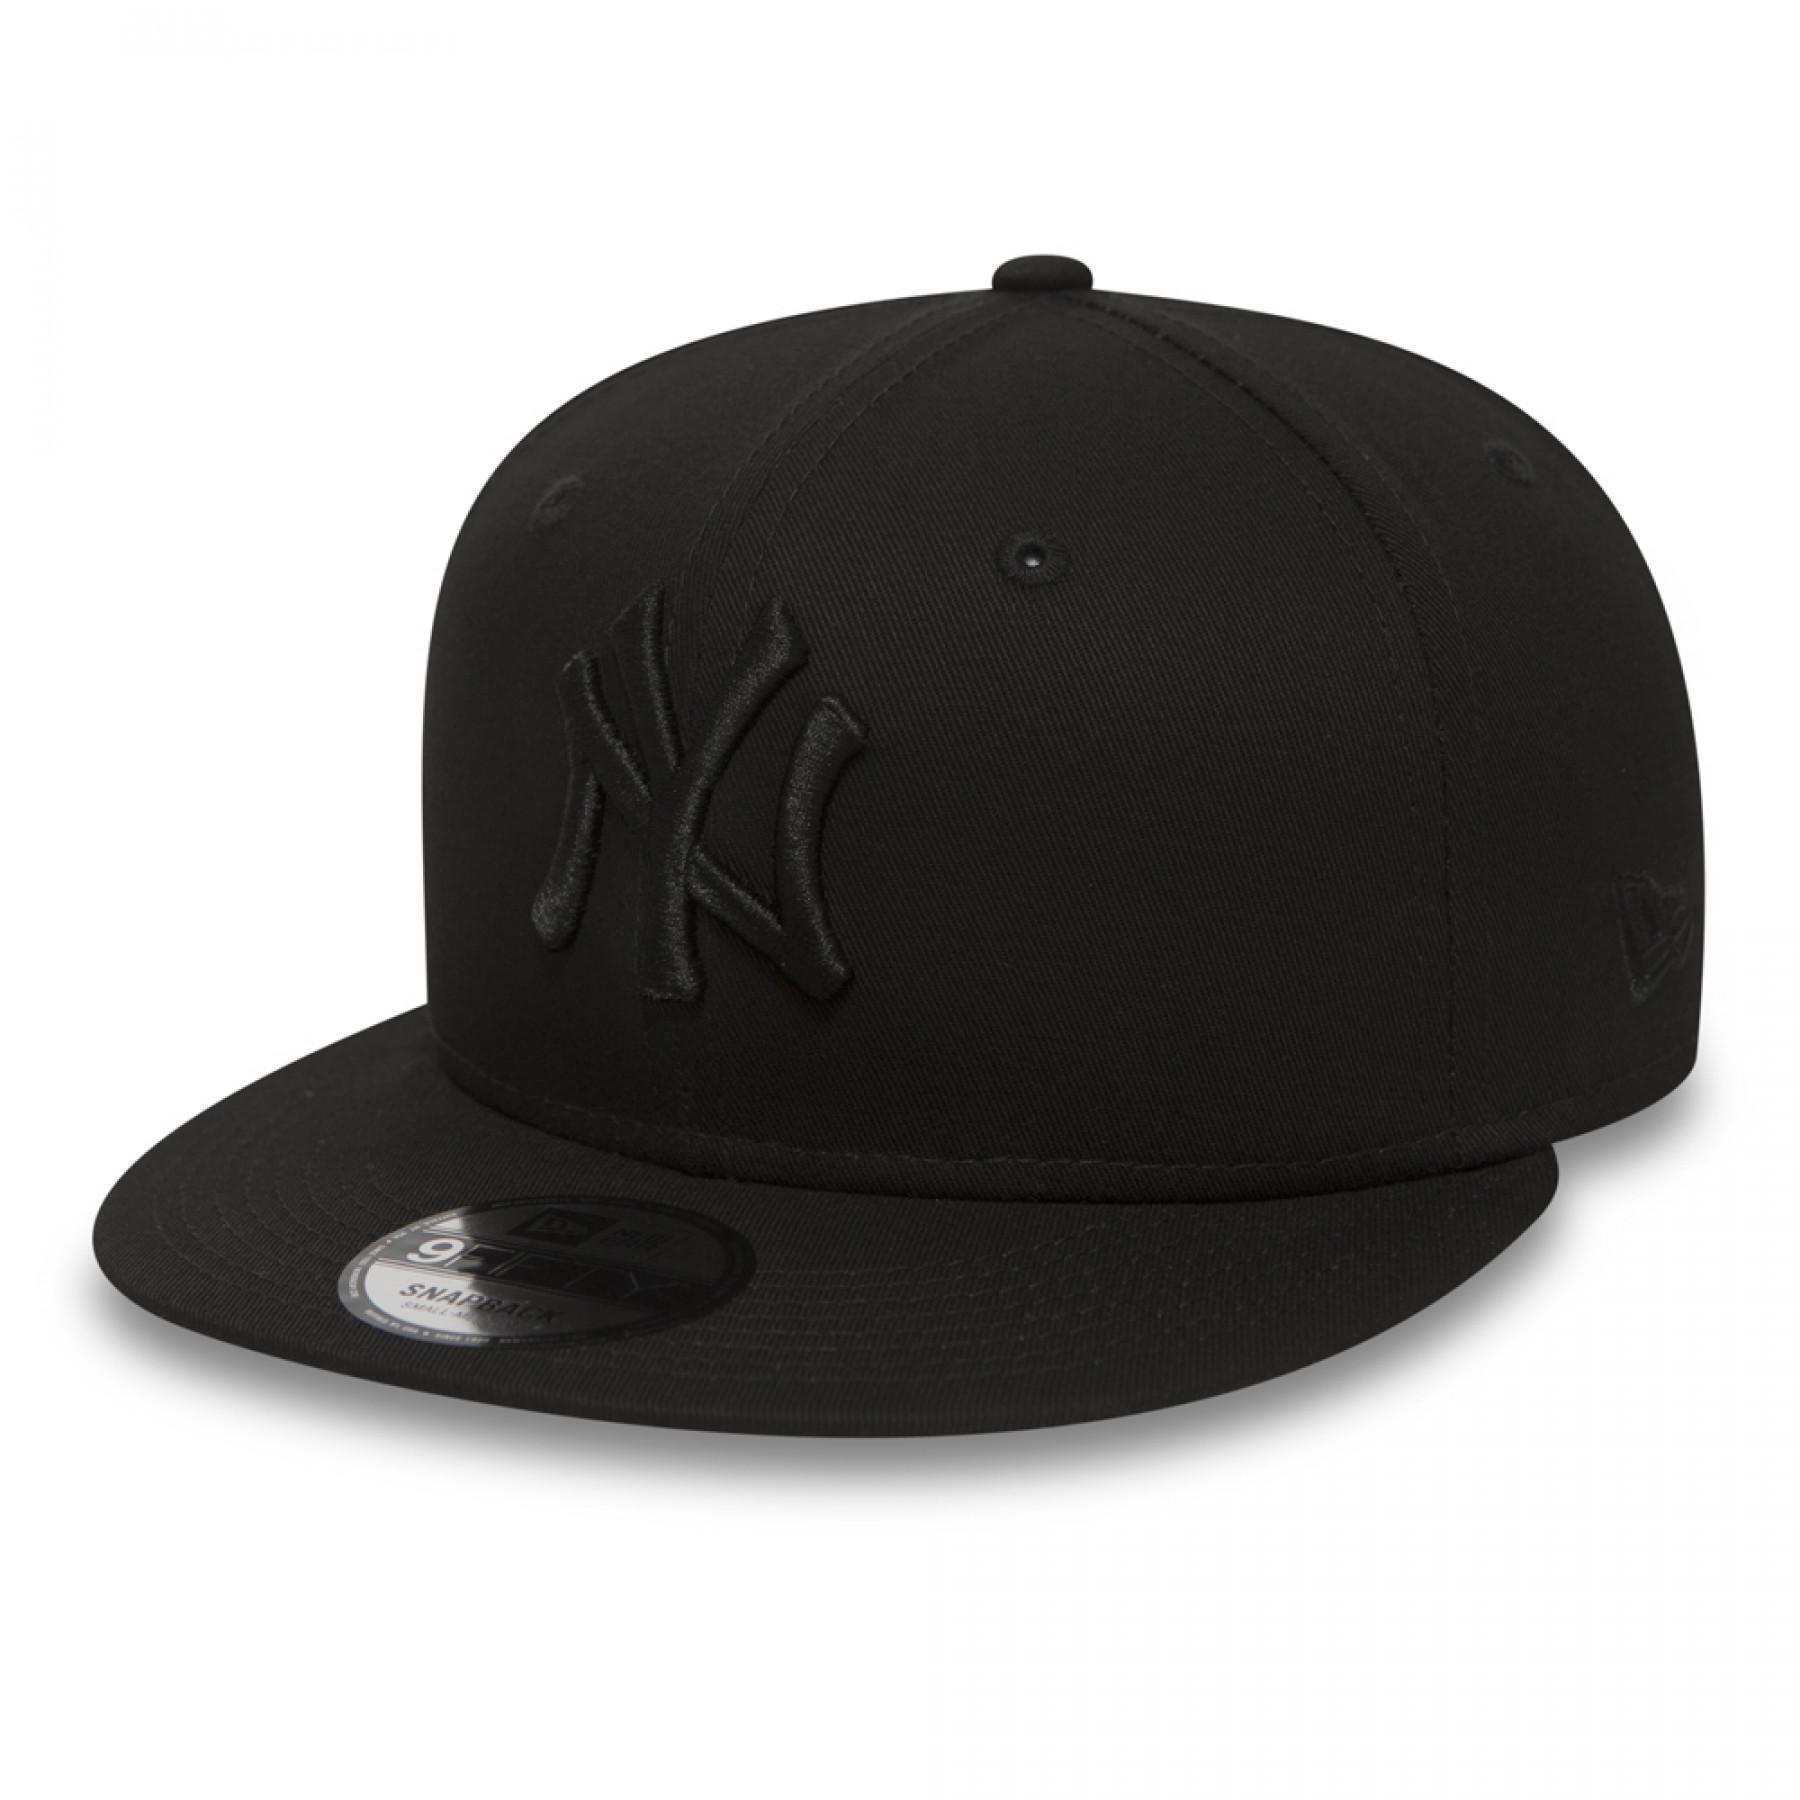 New Era 9fifty Snapback Cap New York Yankees